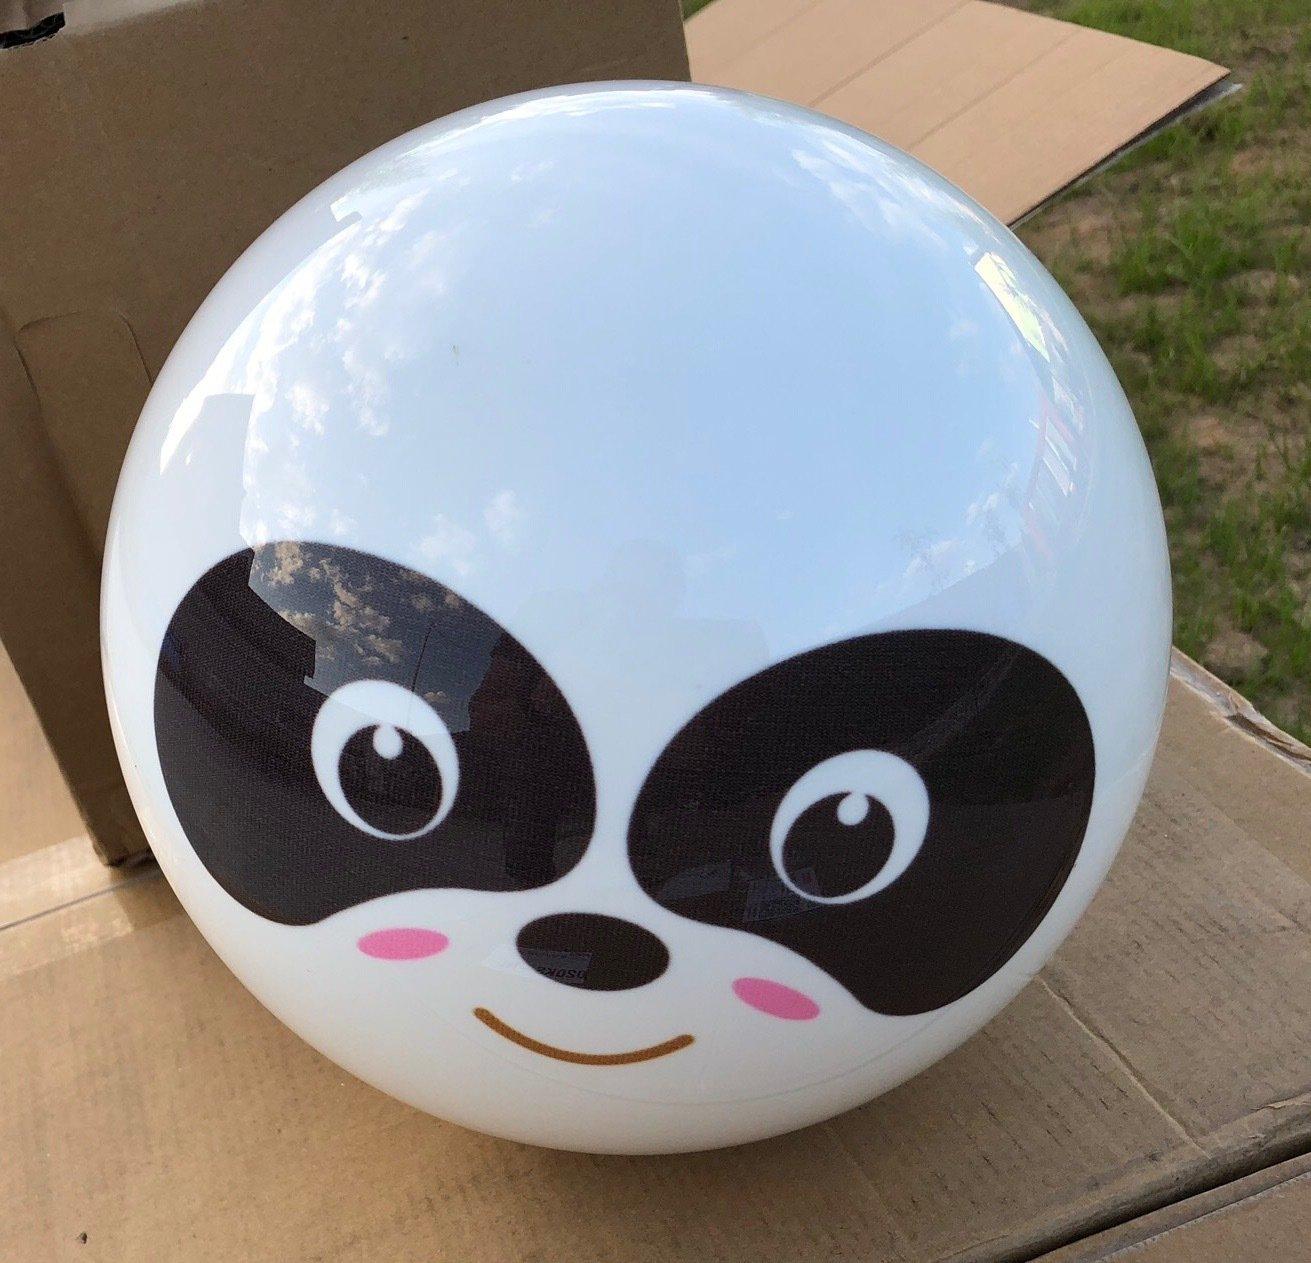 Panda Viz ball PB-038 (8 lbs)